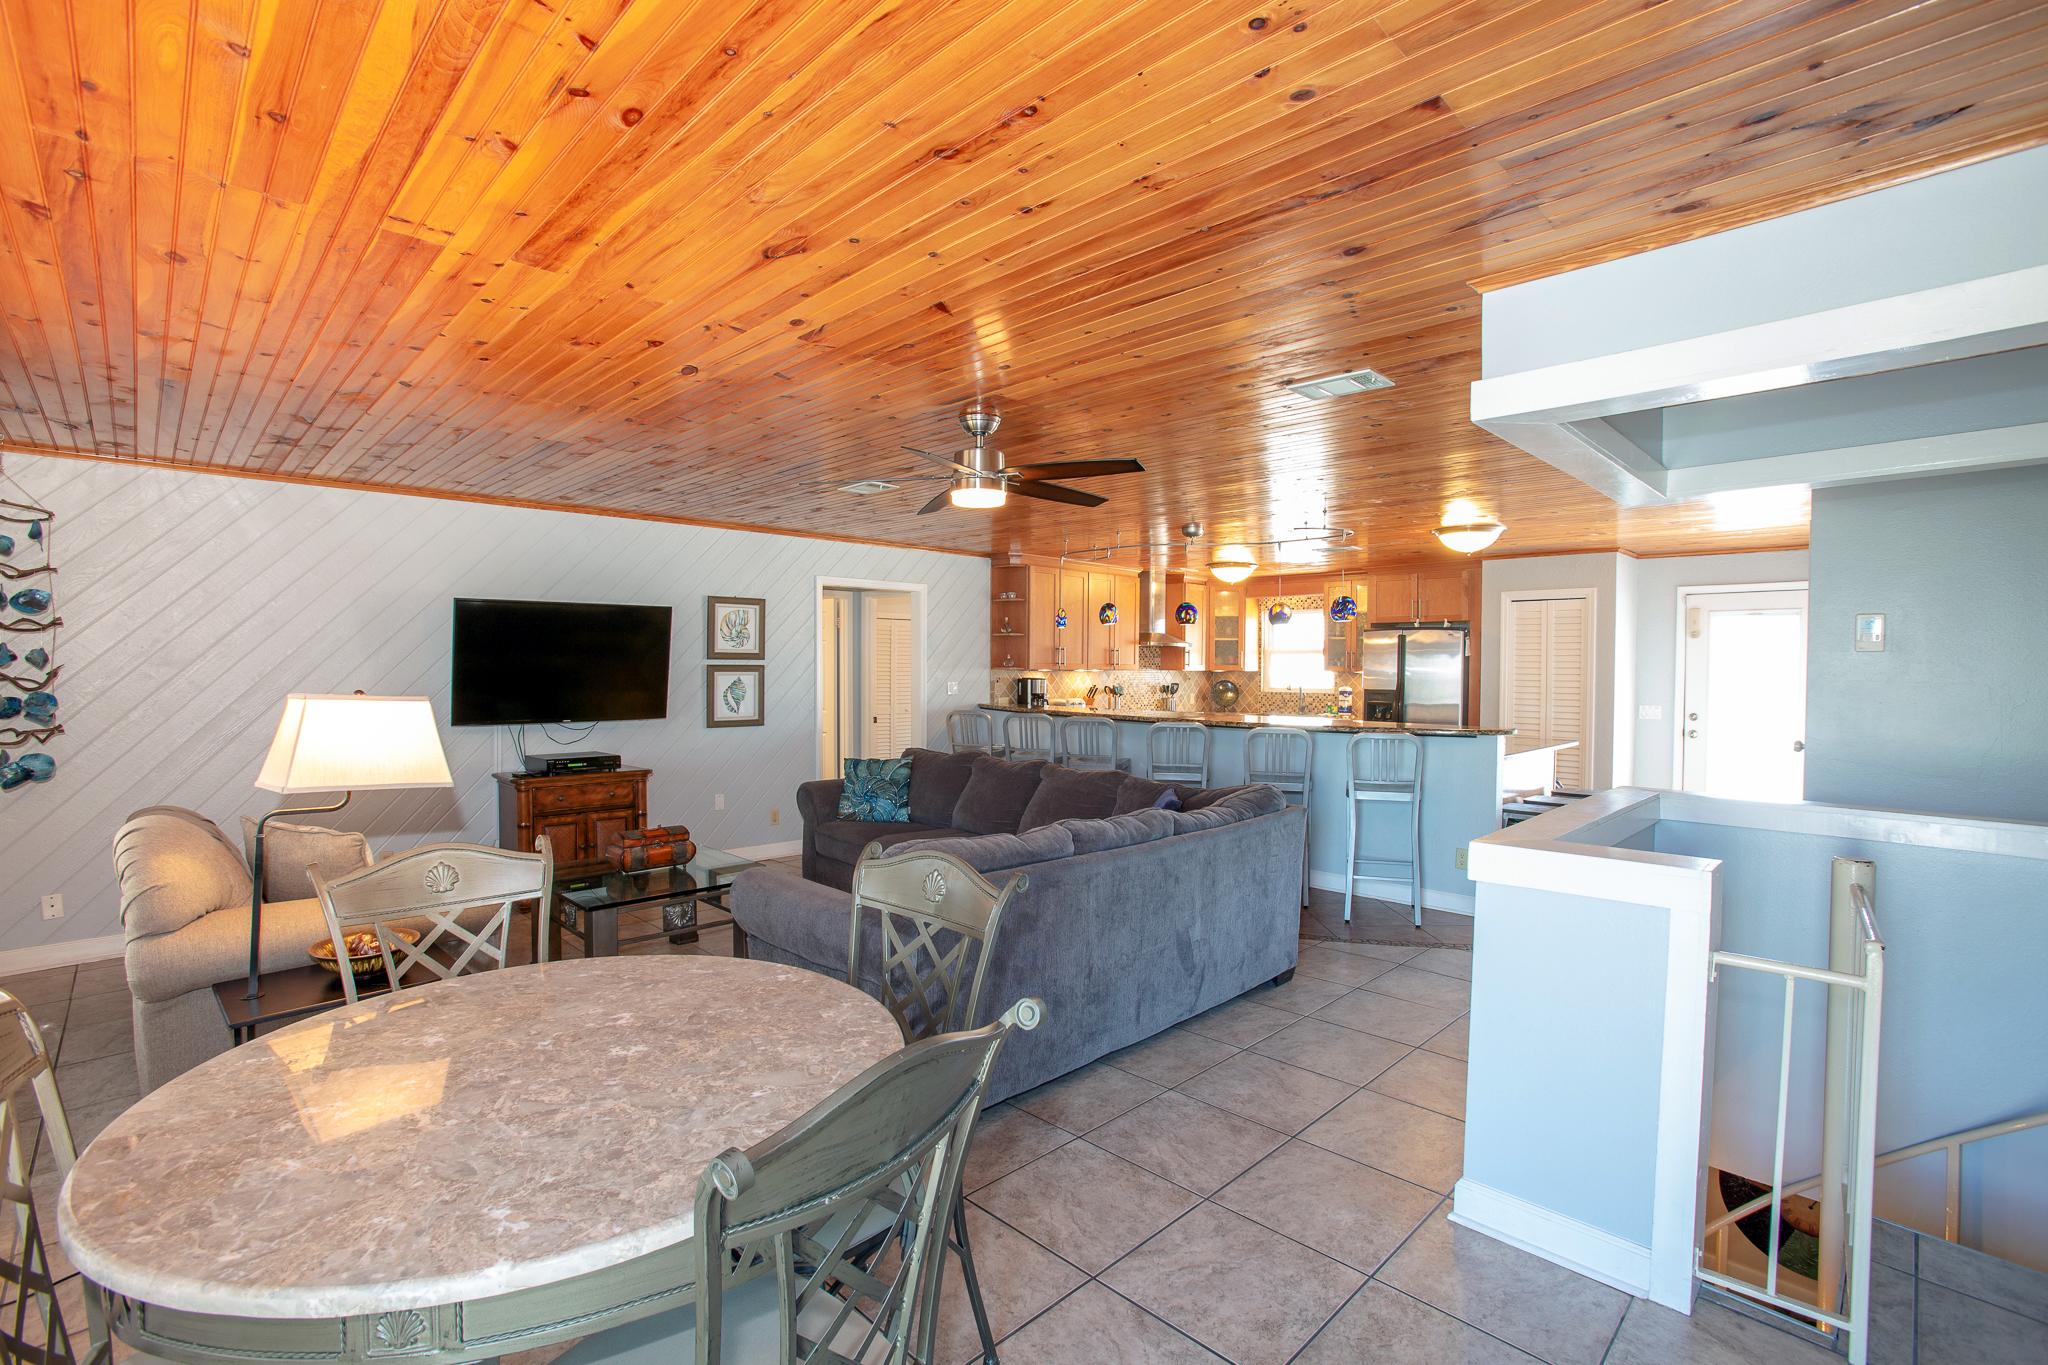 Maldonado 1015 - Sea the Big Picture House/Cottage rental in Pensacola Beach House Rentals in Pensacola Beach Florida - #3